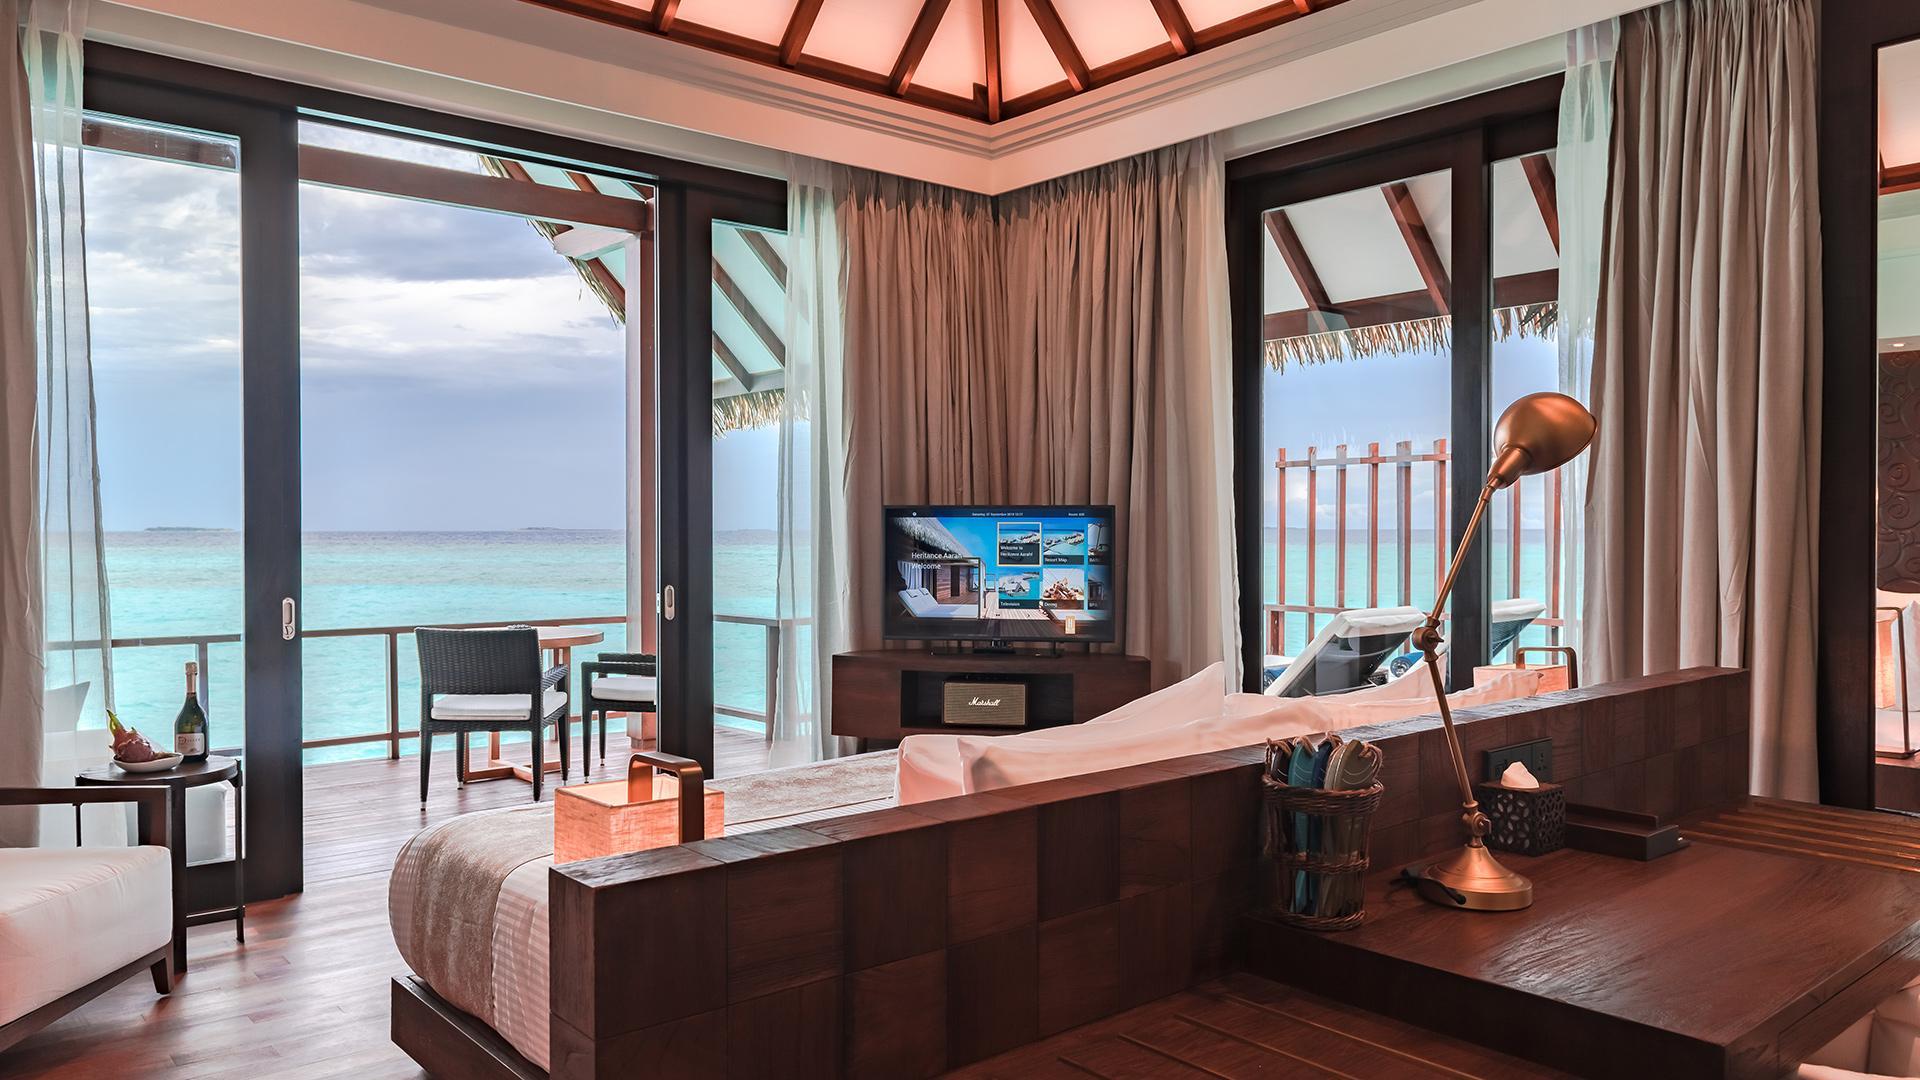 Ocean Villa Sunrise image 1 at Heritance Aarah by null, North Province, Maldives